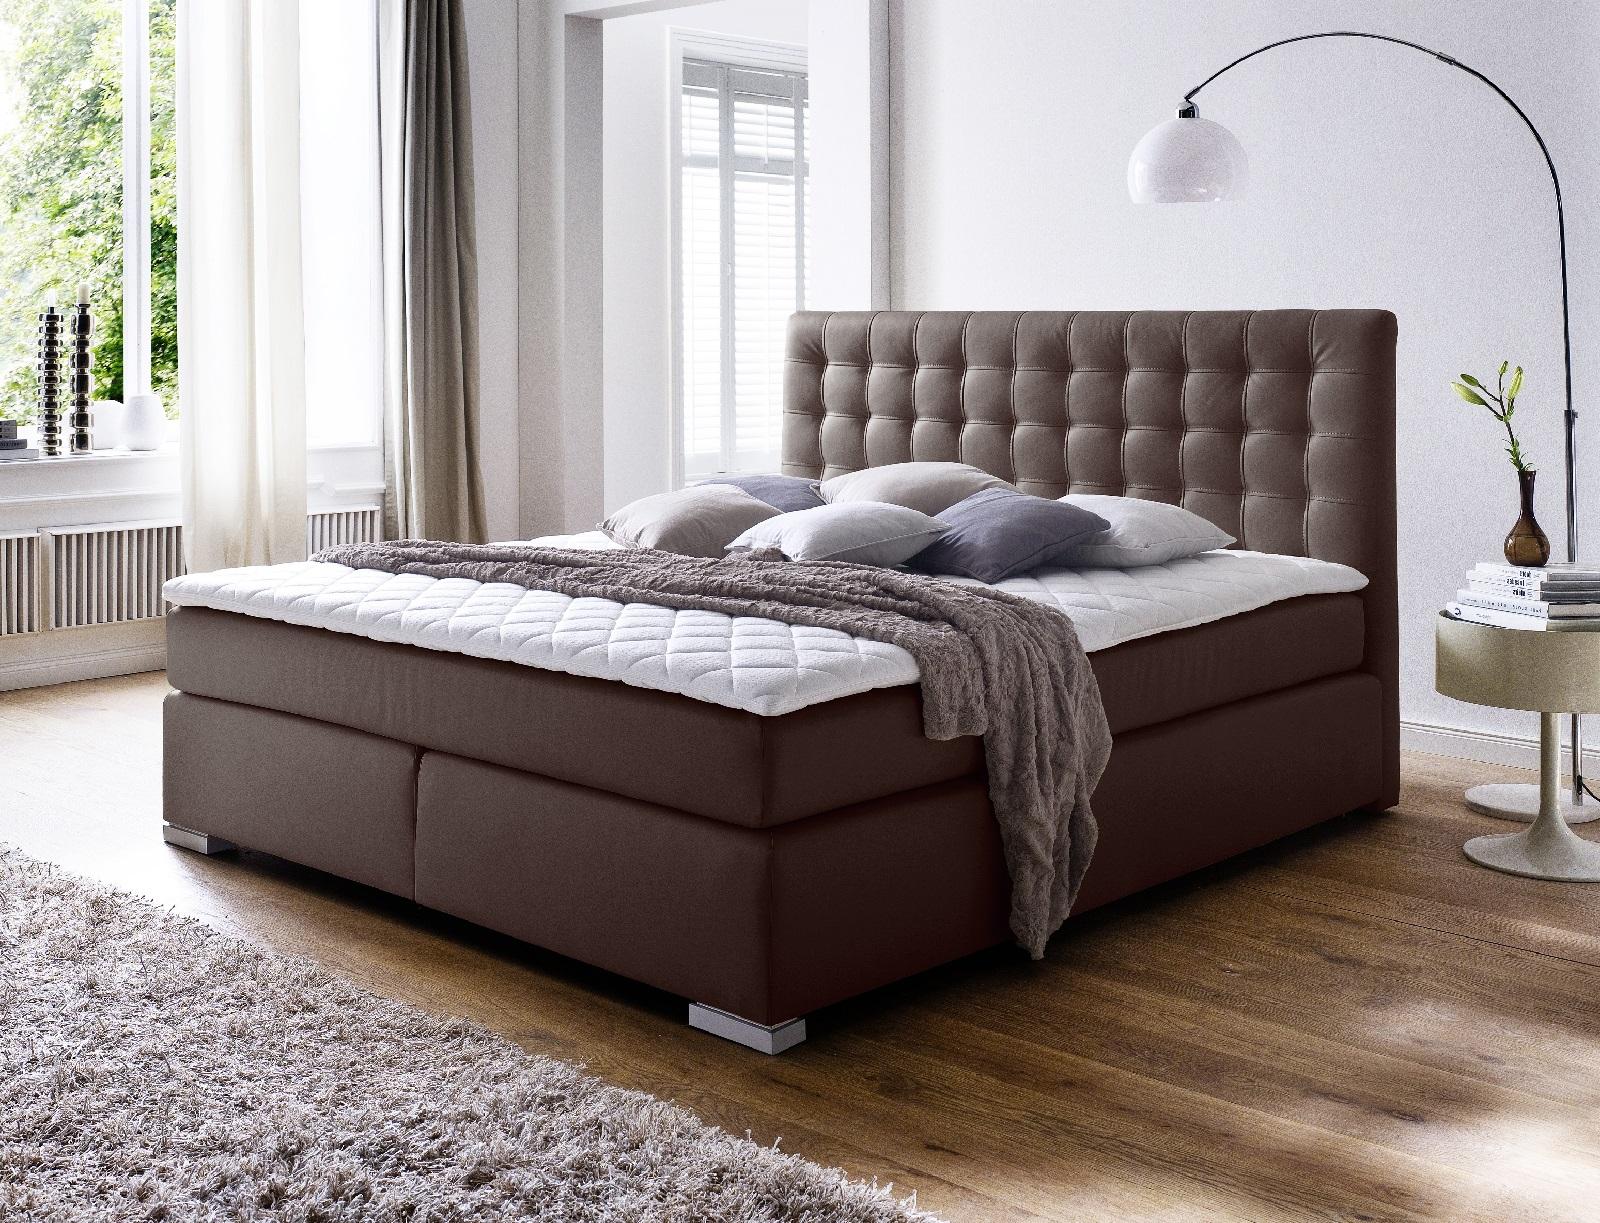 boxspringbett isabelle braun 200cm x 200cm. Black Bedroom Furniture Sets. Home Design Ideas